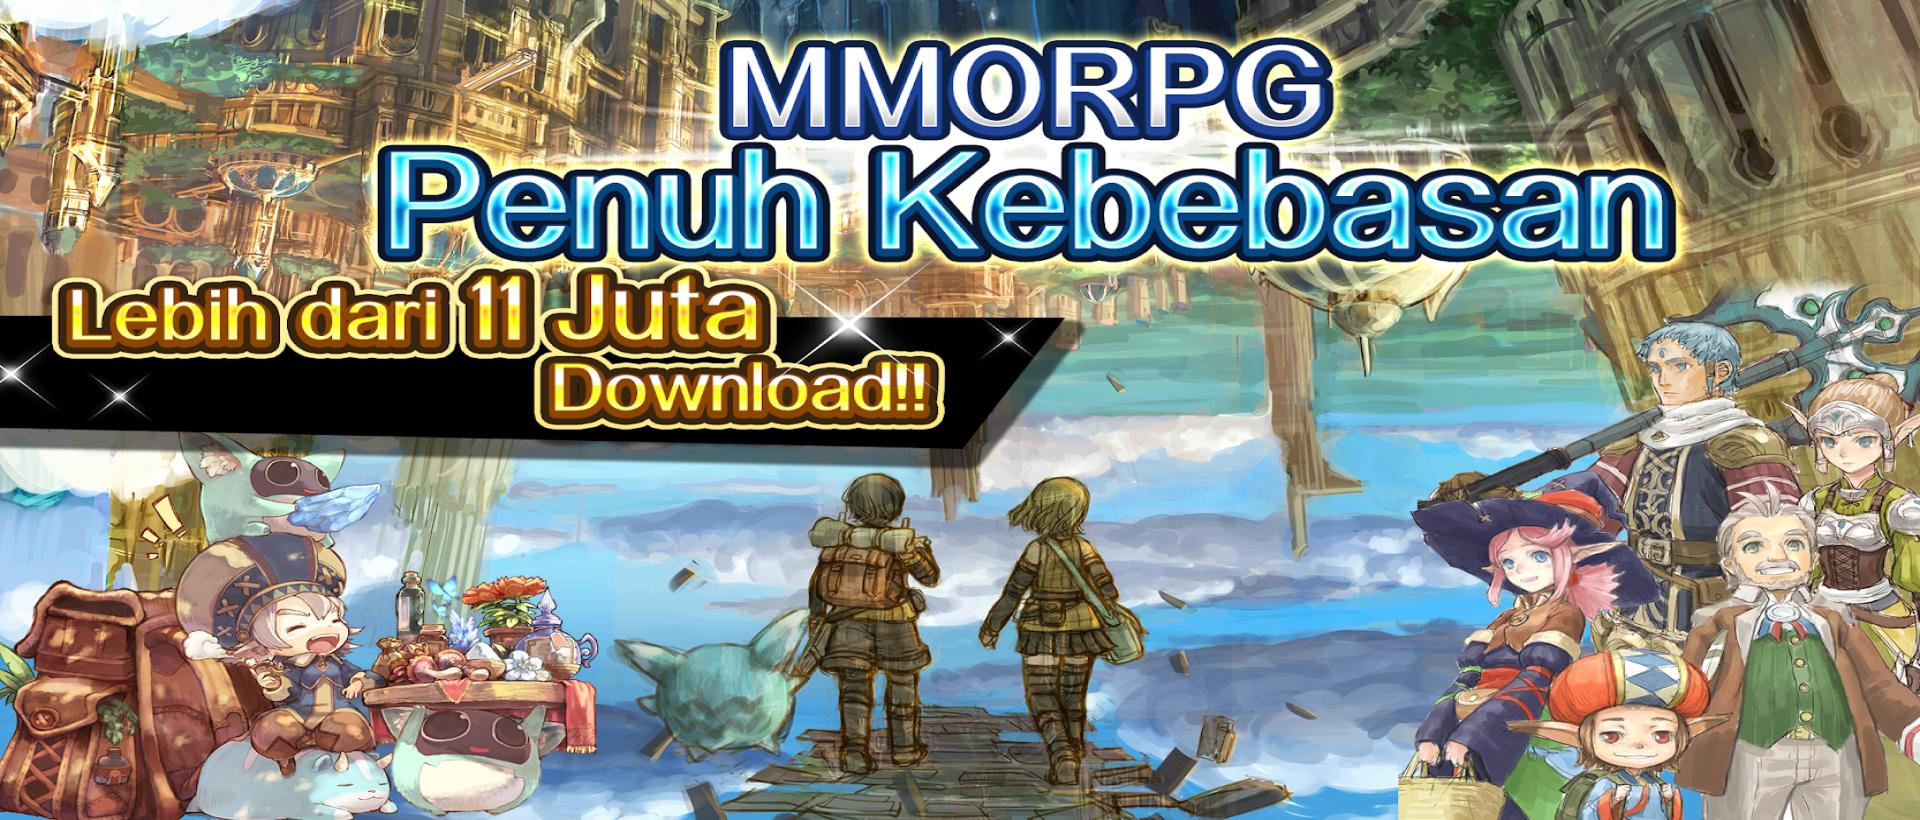 RPG Toram Online - MMORPG